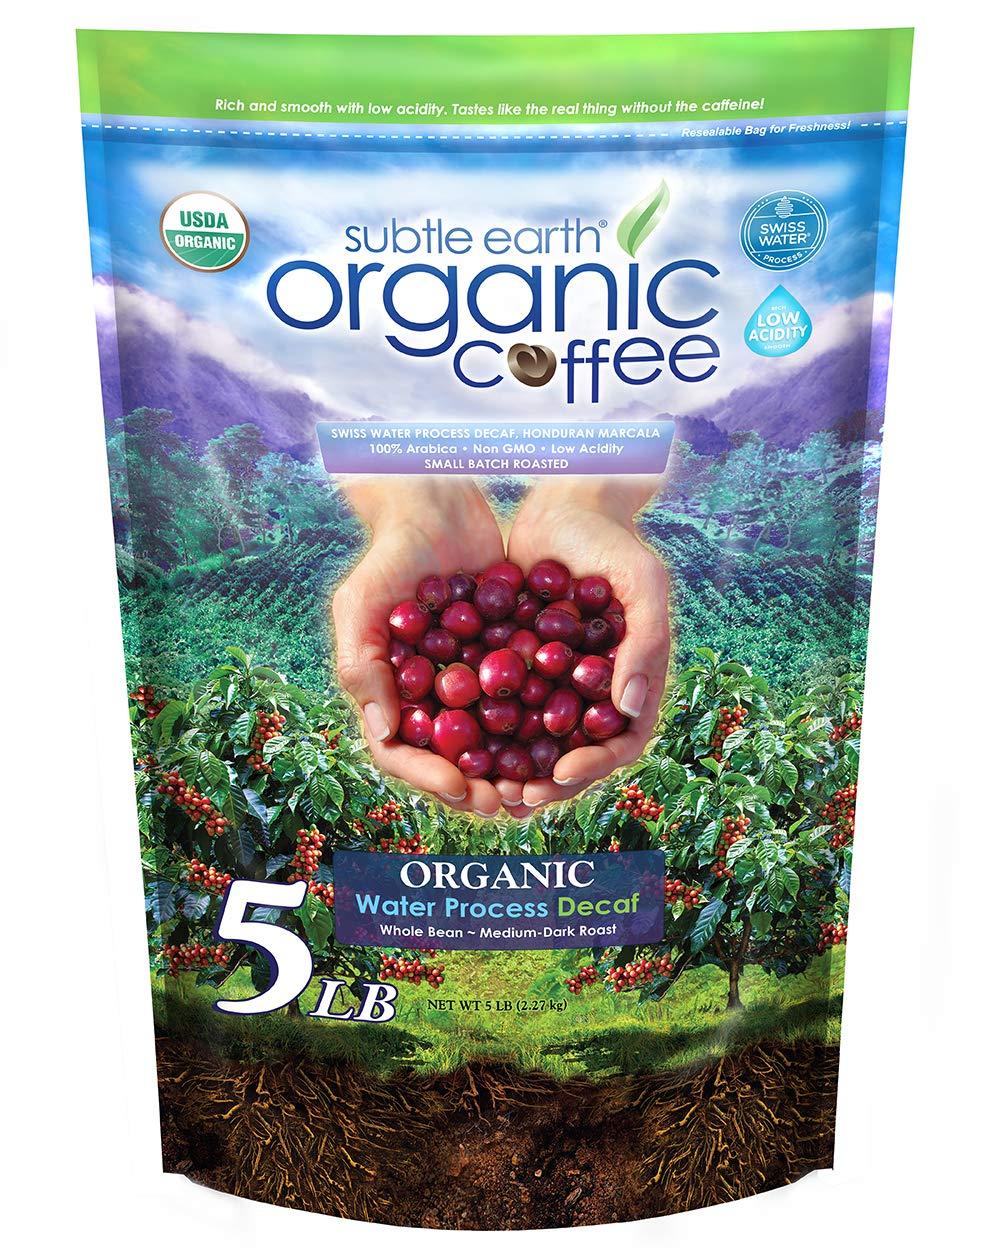 5LB Subtle Earth Organic Swiss Water Process Honduran Marcala Gourmet Coffee Decaffeinated - Medium-Dark Roast - Whole Bean Coffee - 5 Pound ( 5 lb ) Bag